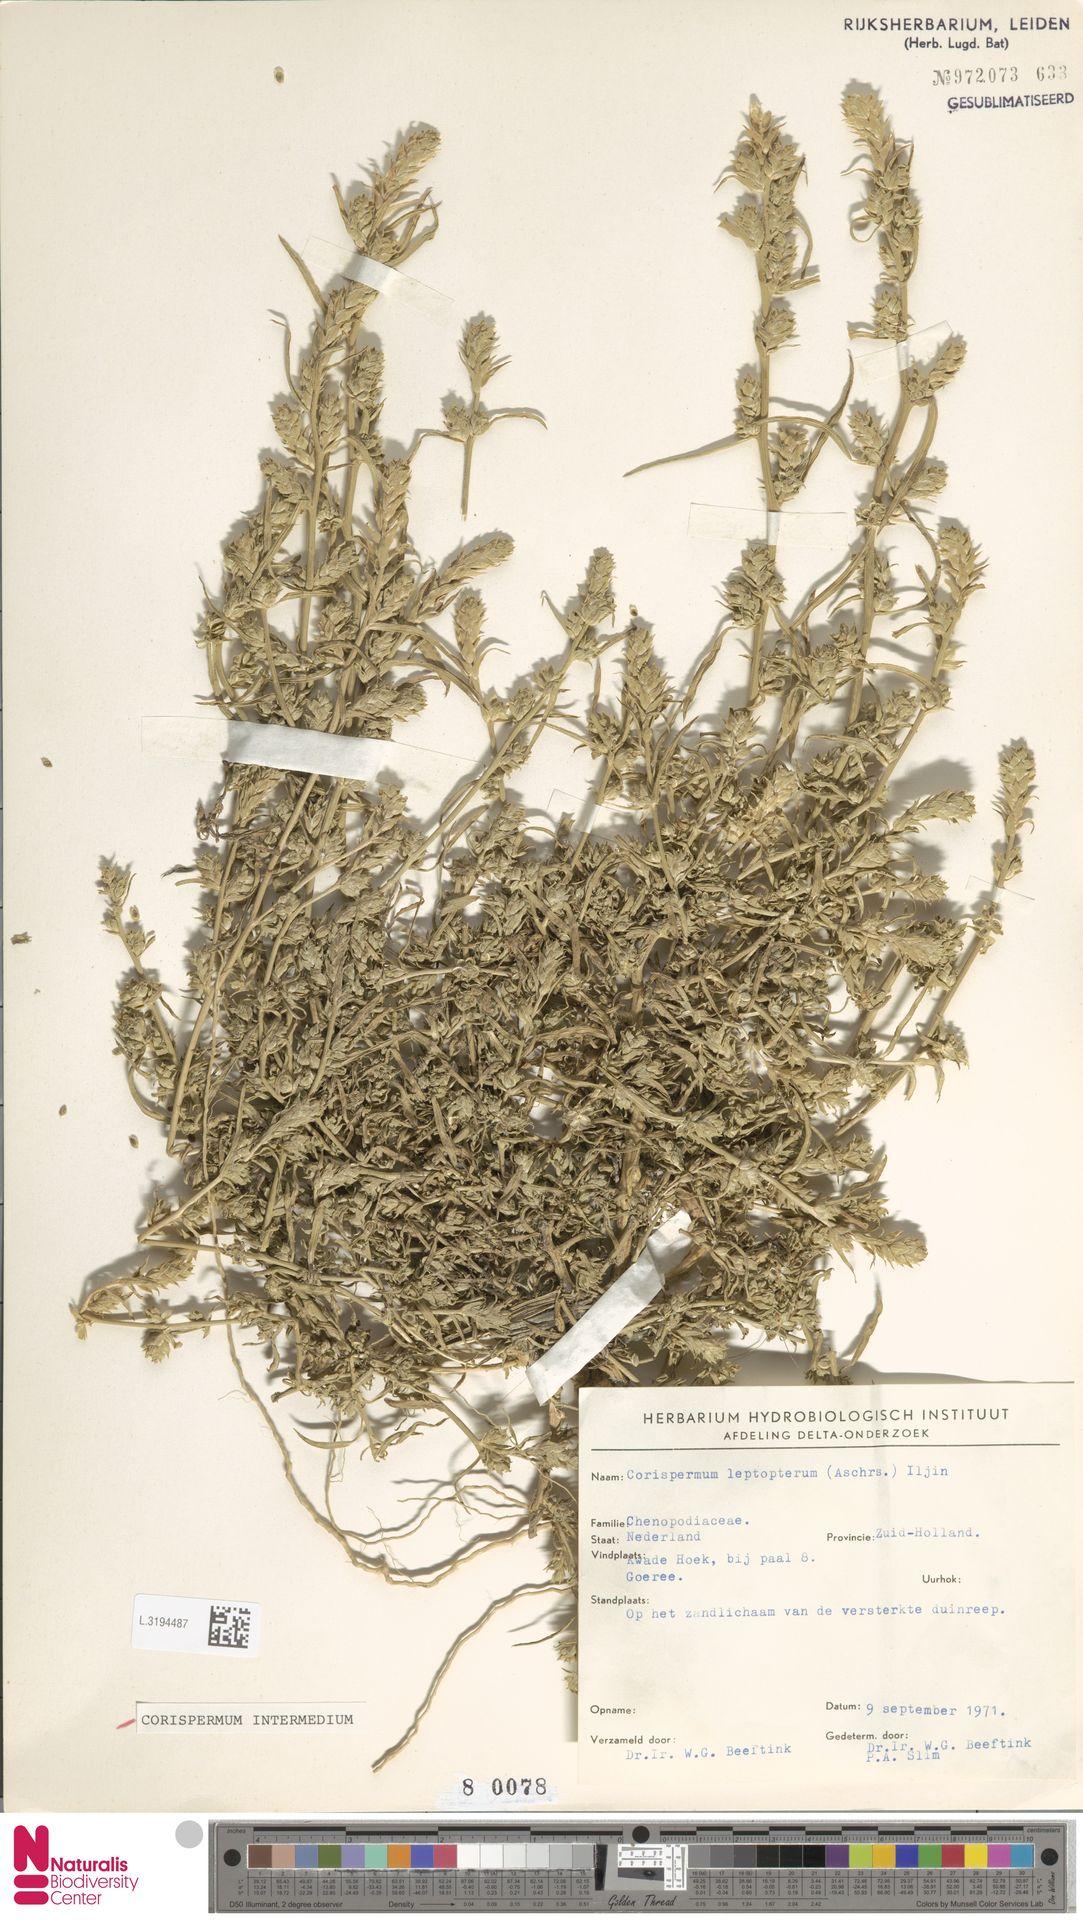 L.3194487 | Corispermum intermedium Schweigg.